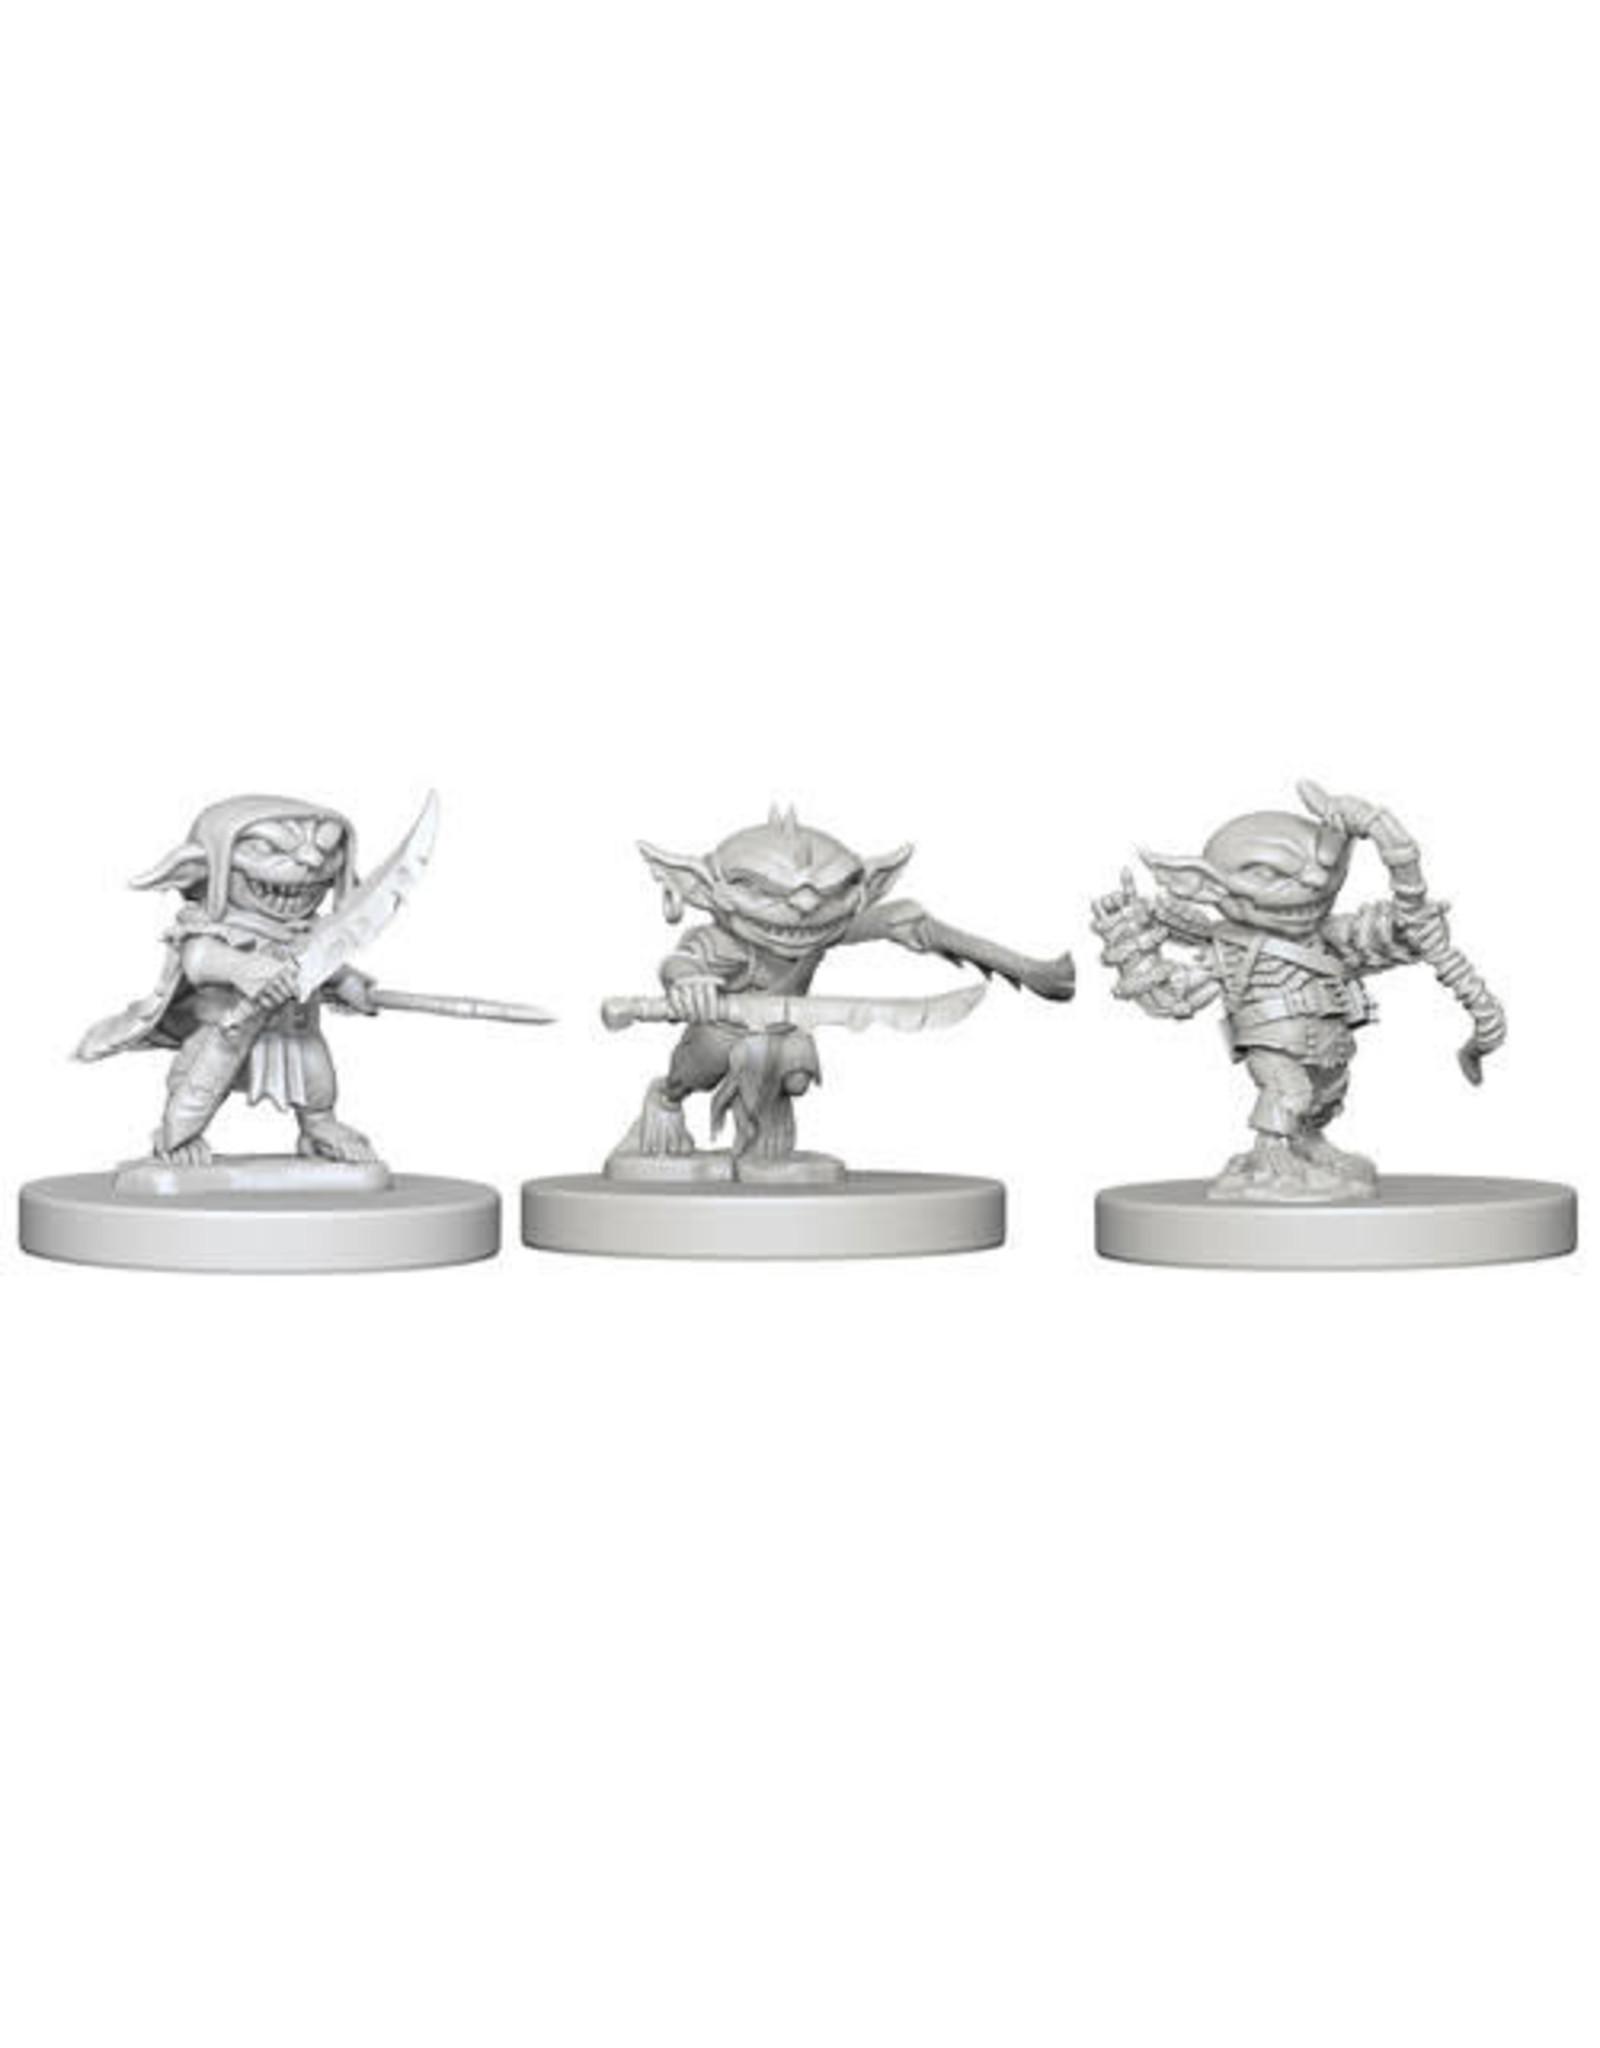 WizKids Pathfinder Deep Cuts Unpainted Miniatures: W1 Goblins